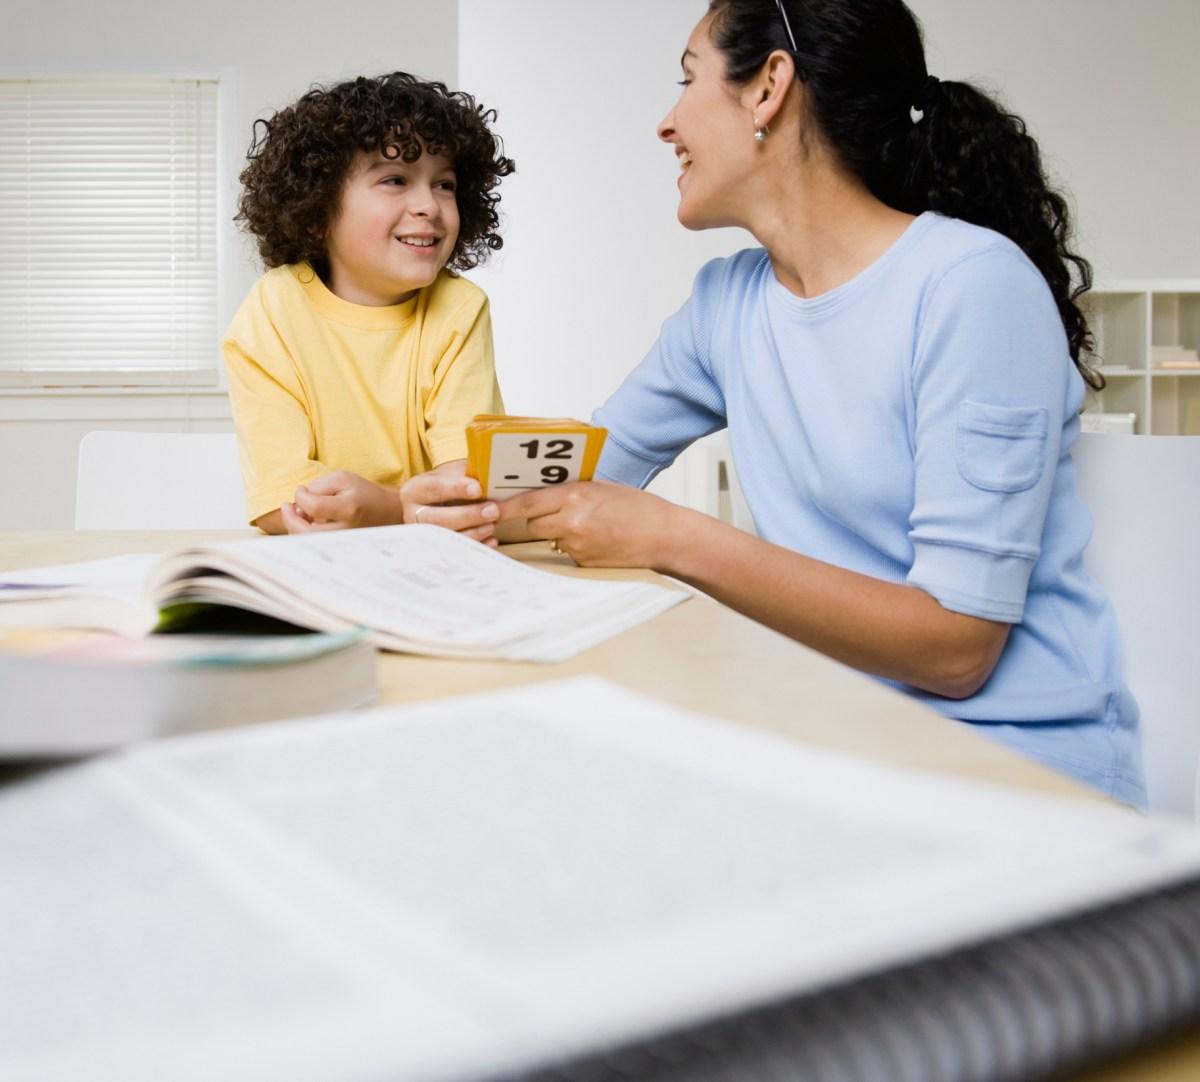 son-helping-mother-onlayn